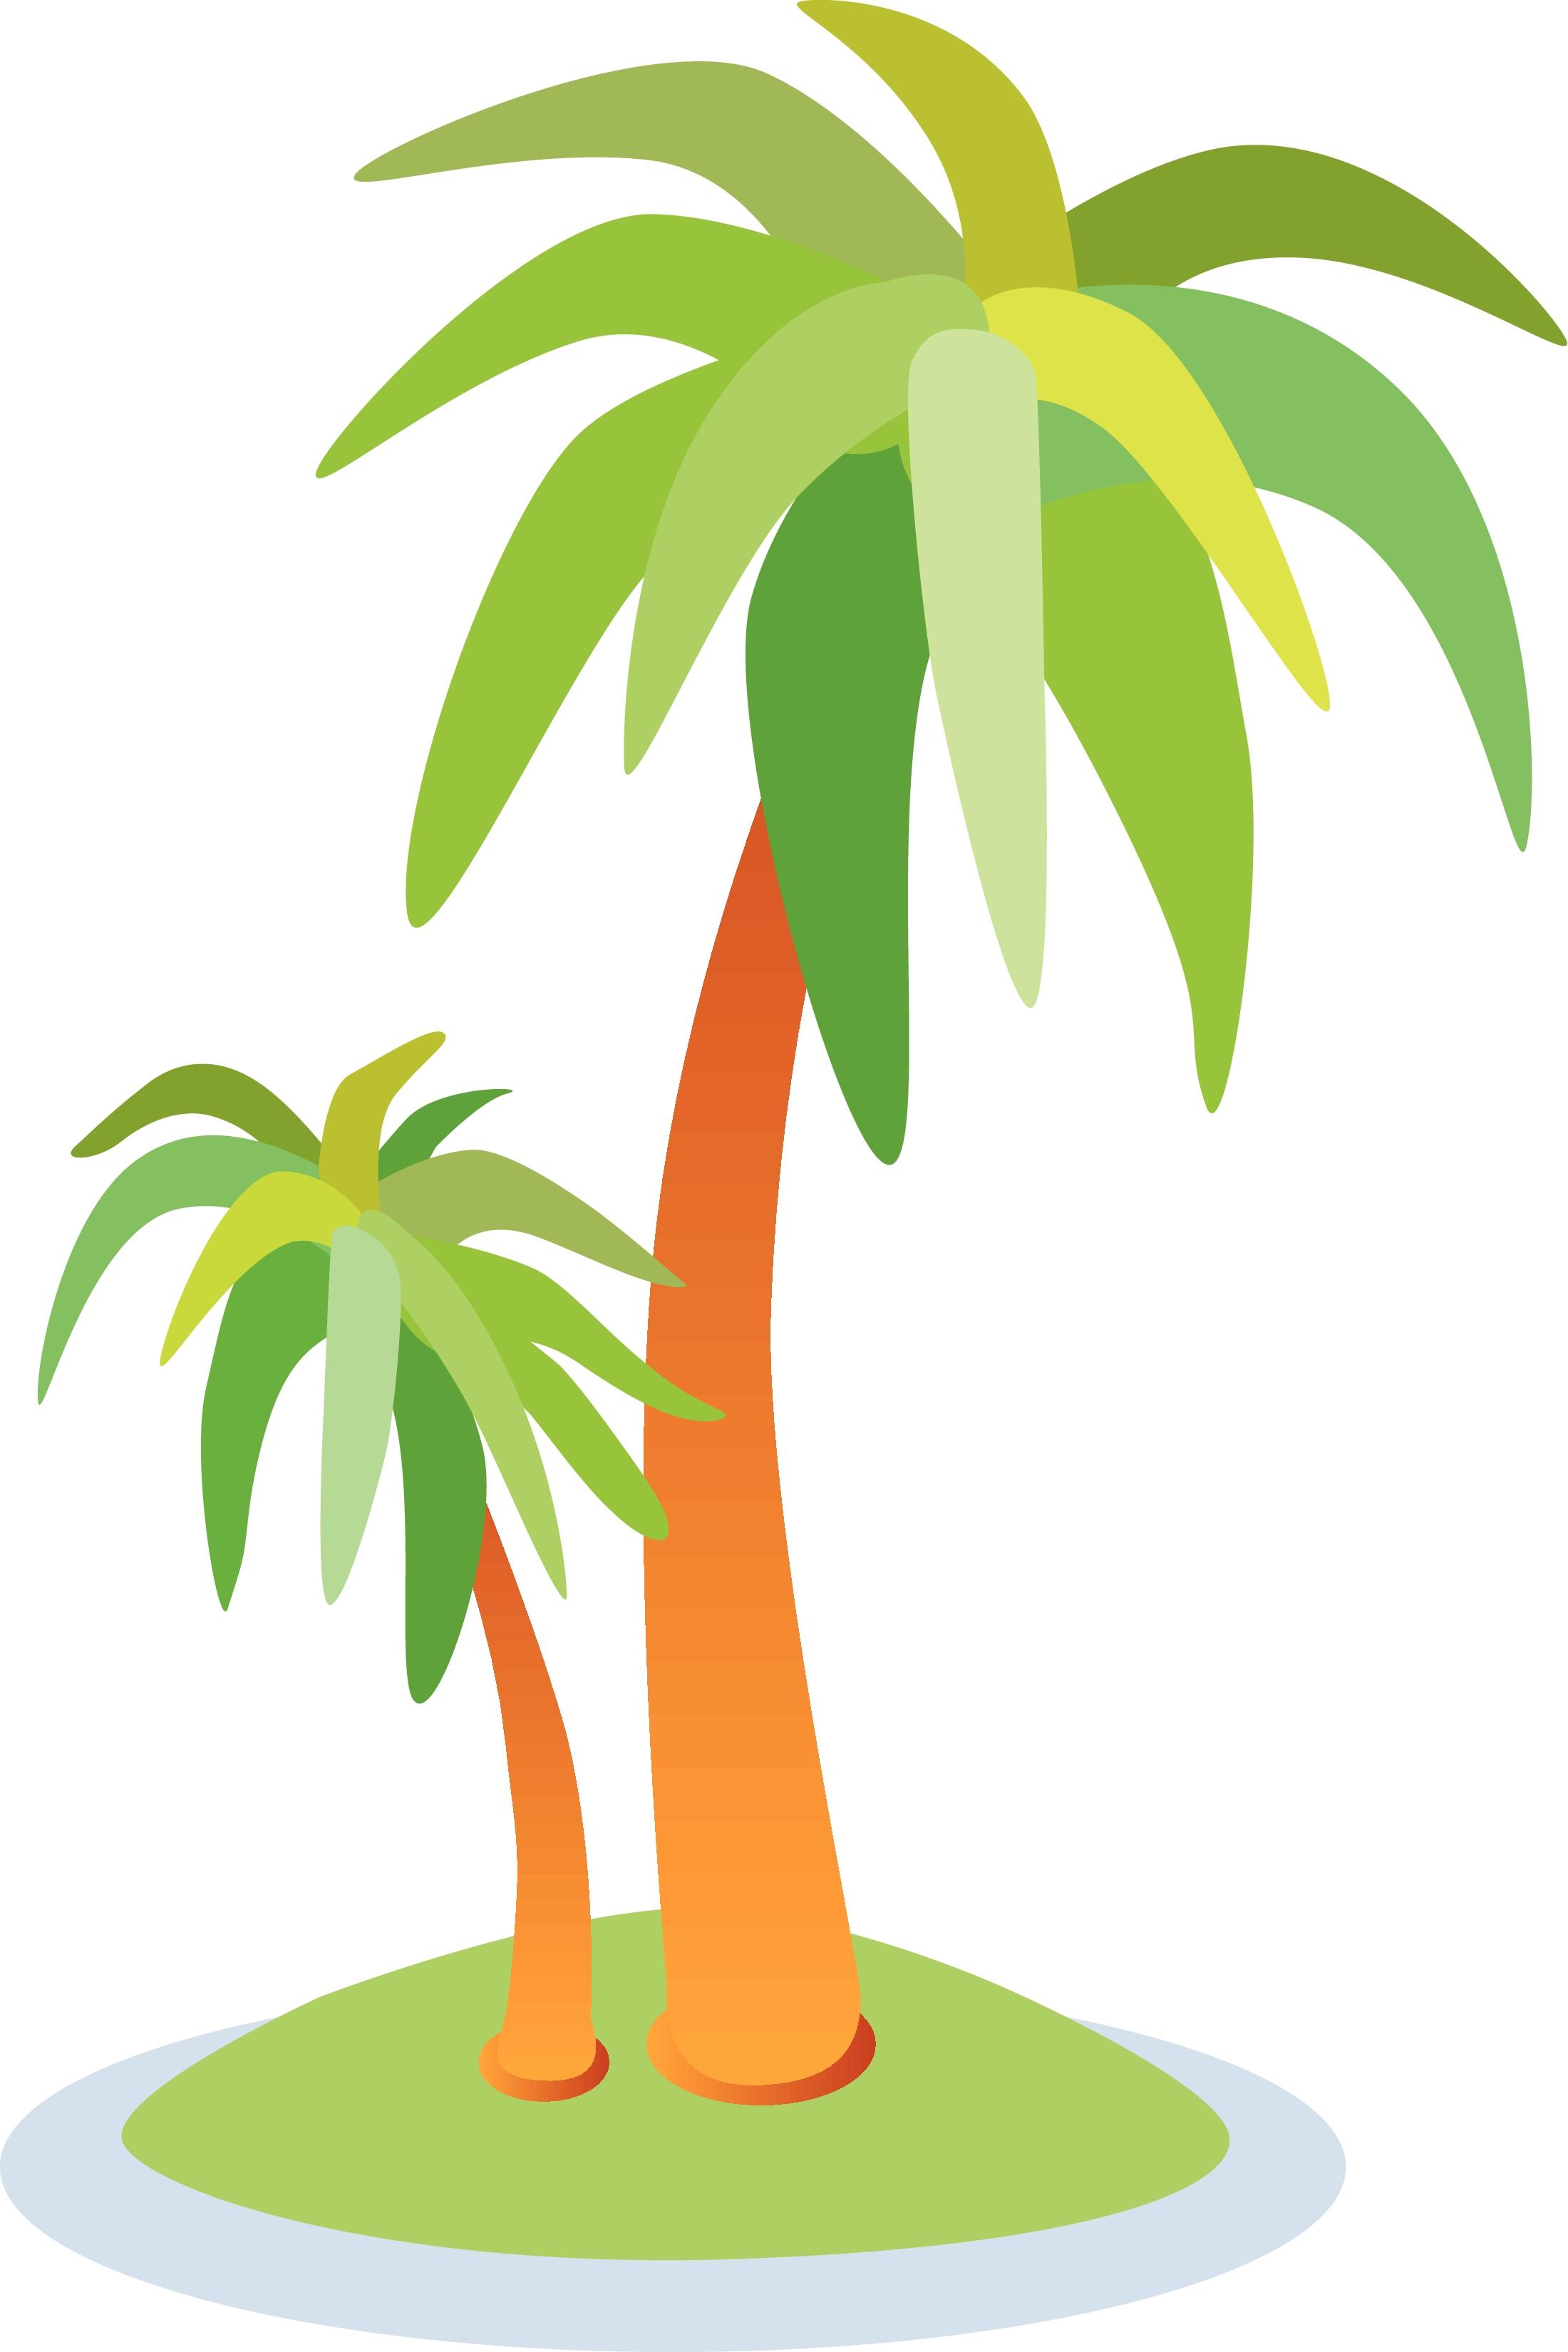 Palm flower clipart #3